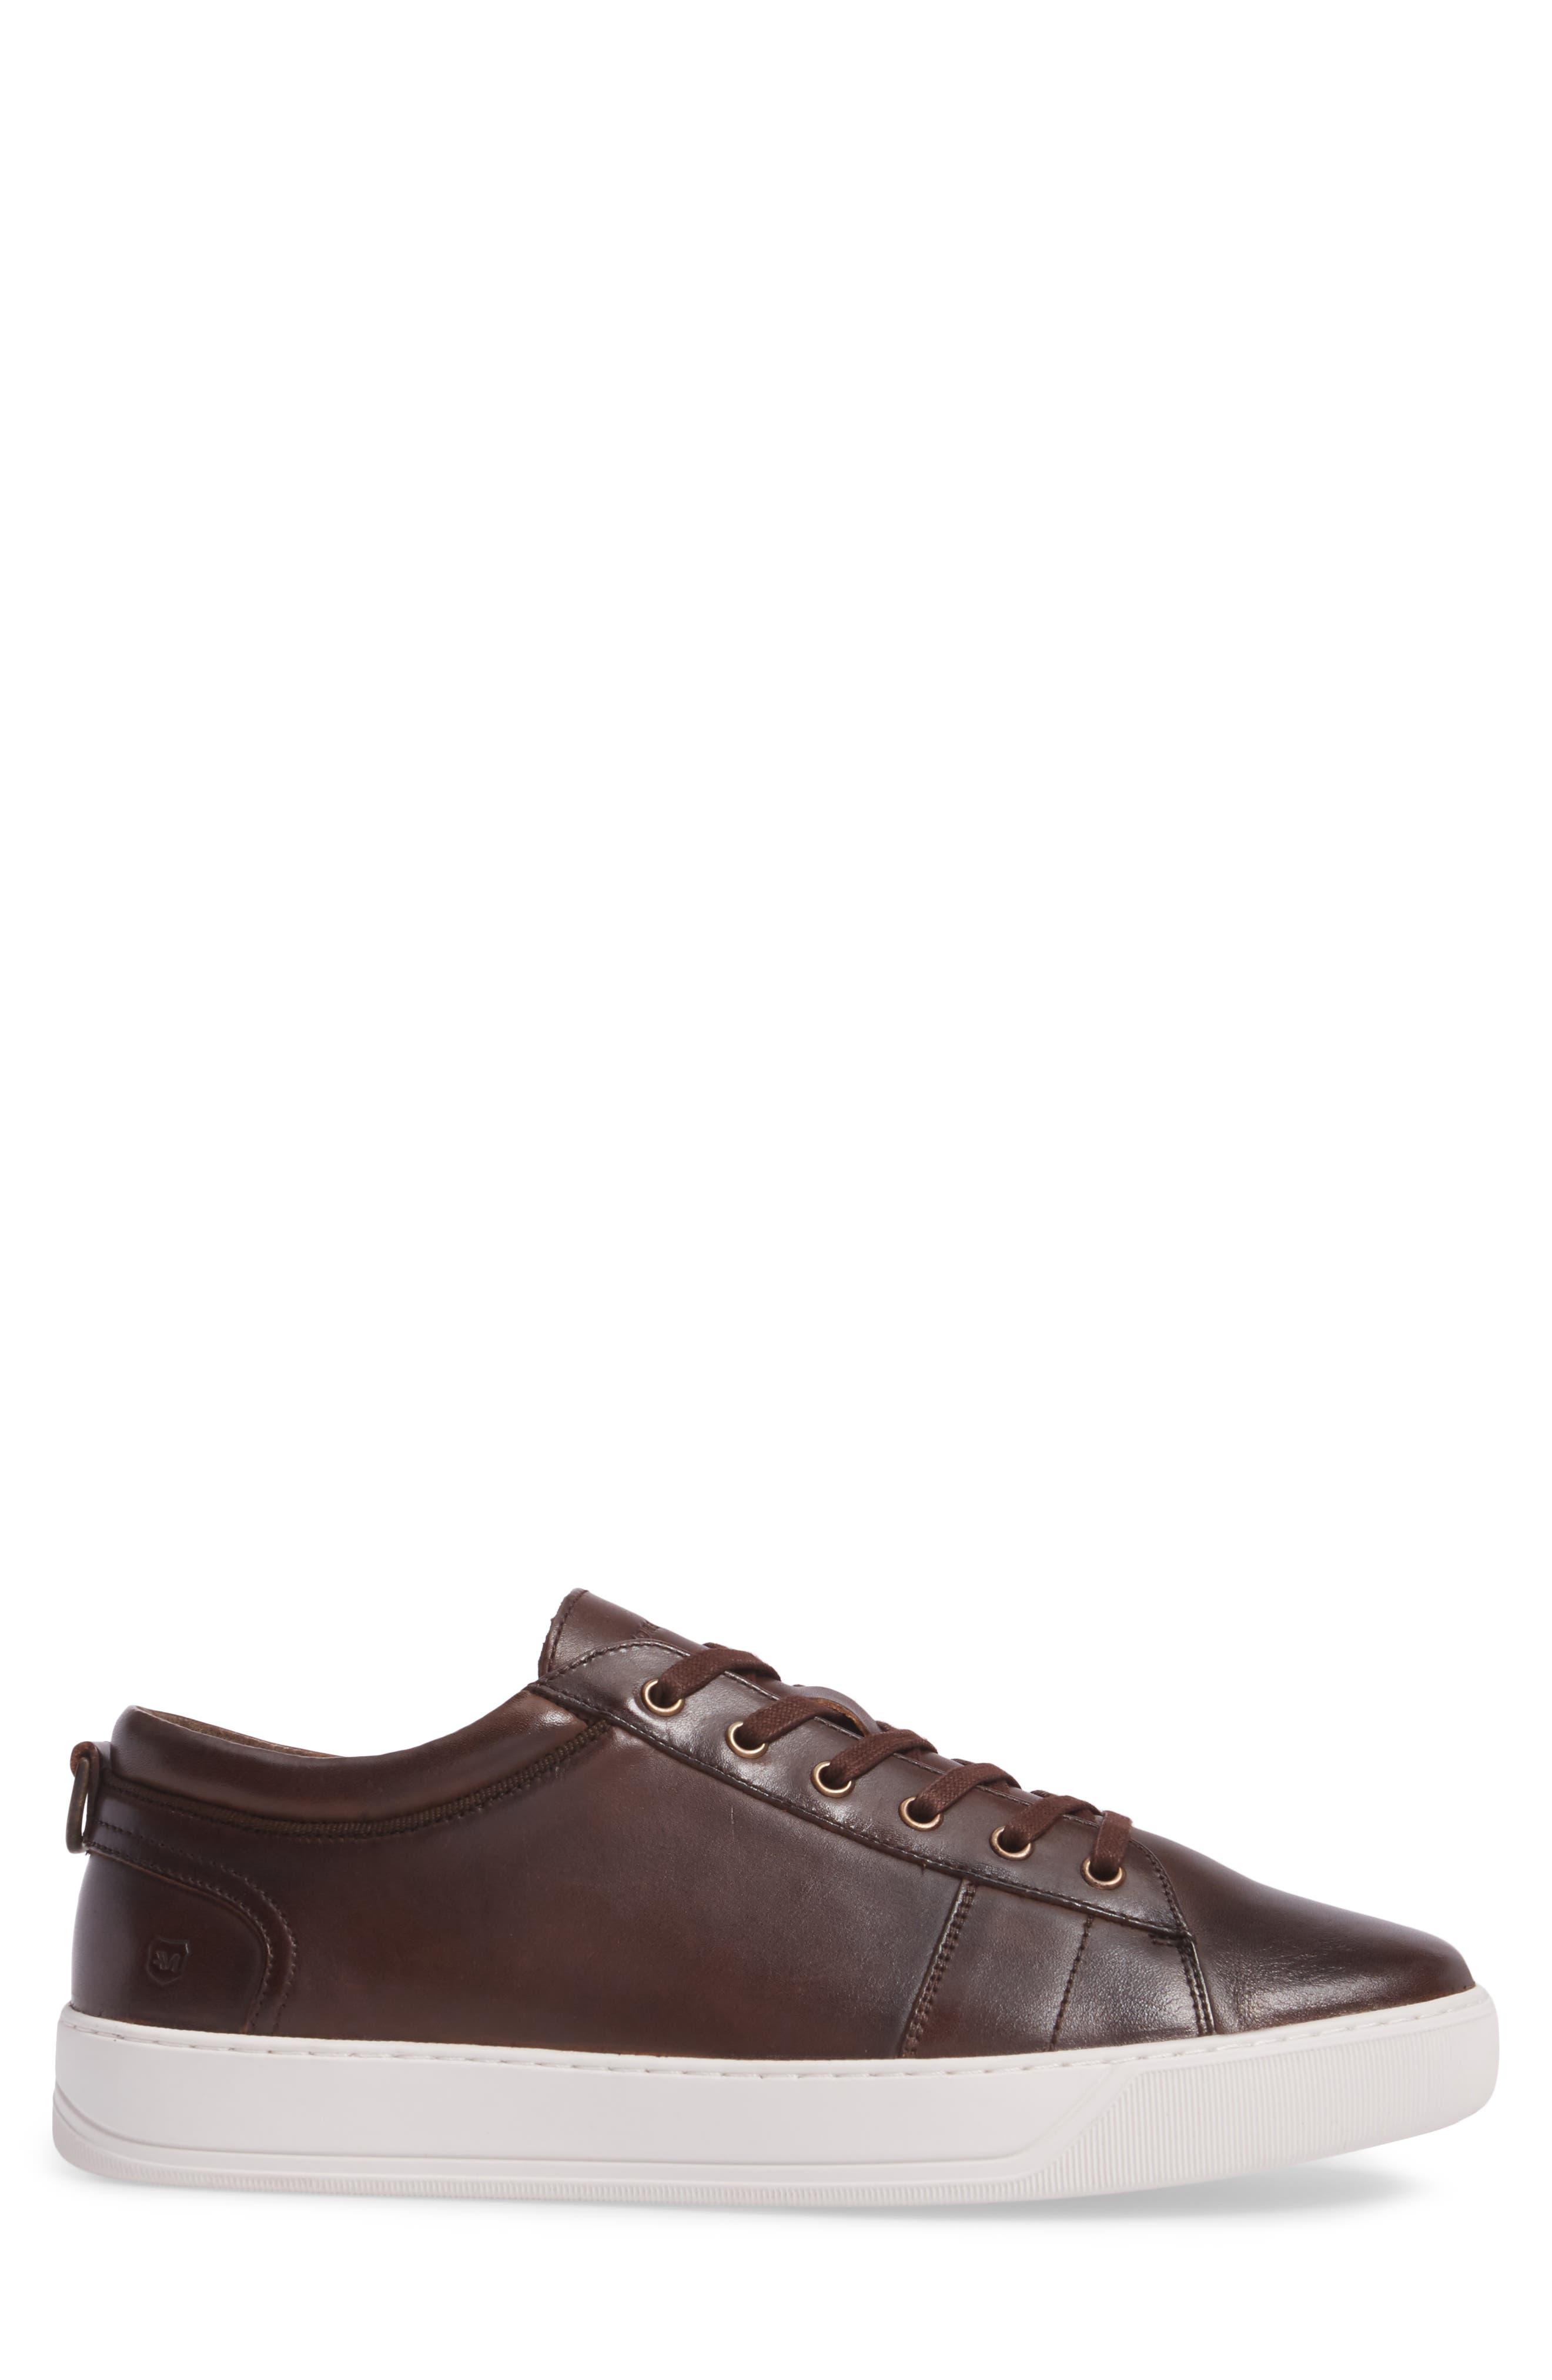 'Darwood' Sneaker,                             Alternate thumbnail 3, color,                             Dark Brown/ White Leather